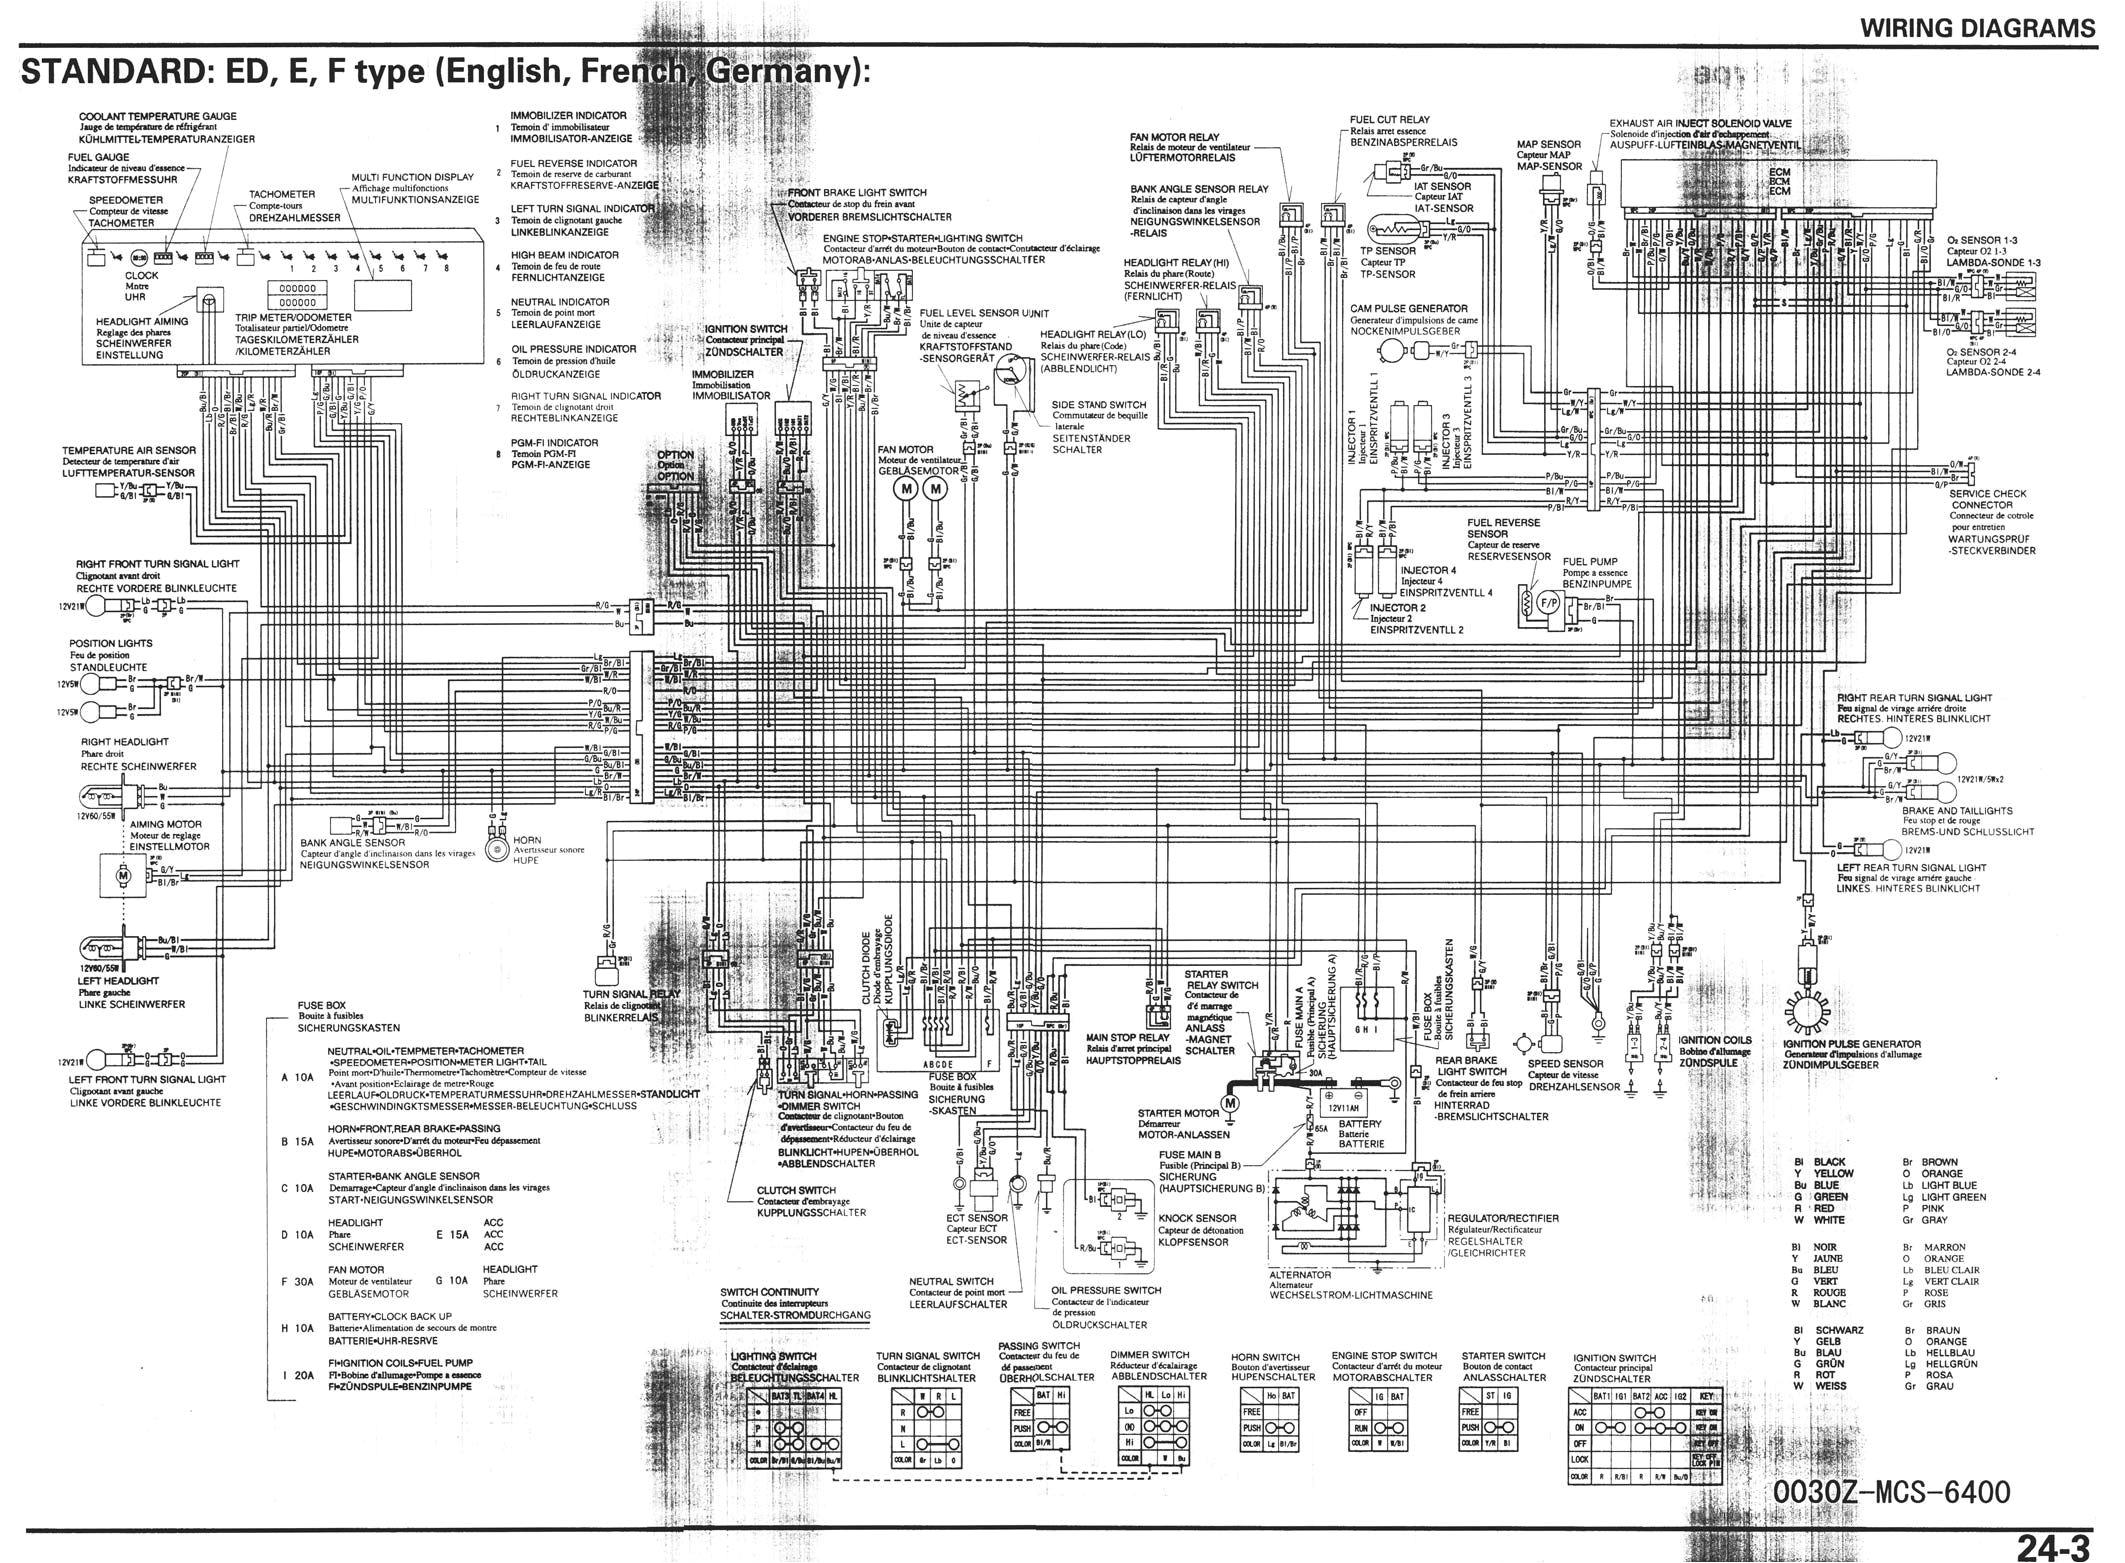 2012 Chevy Traverse Wiring Diagram 4c6 2014 Bmw K 1300 S Wiring Diagram Wiring Library